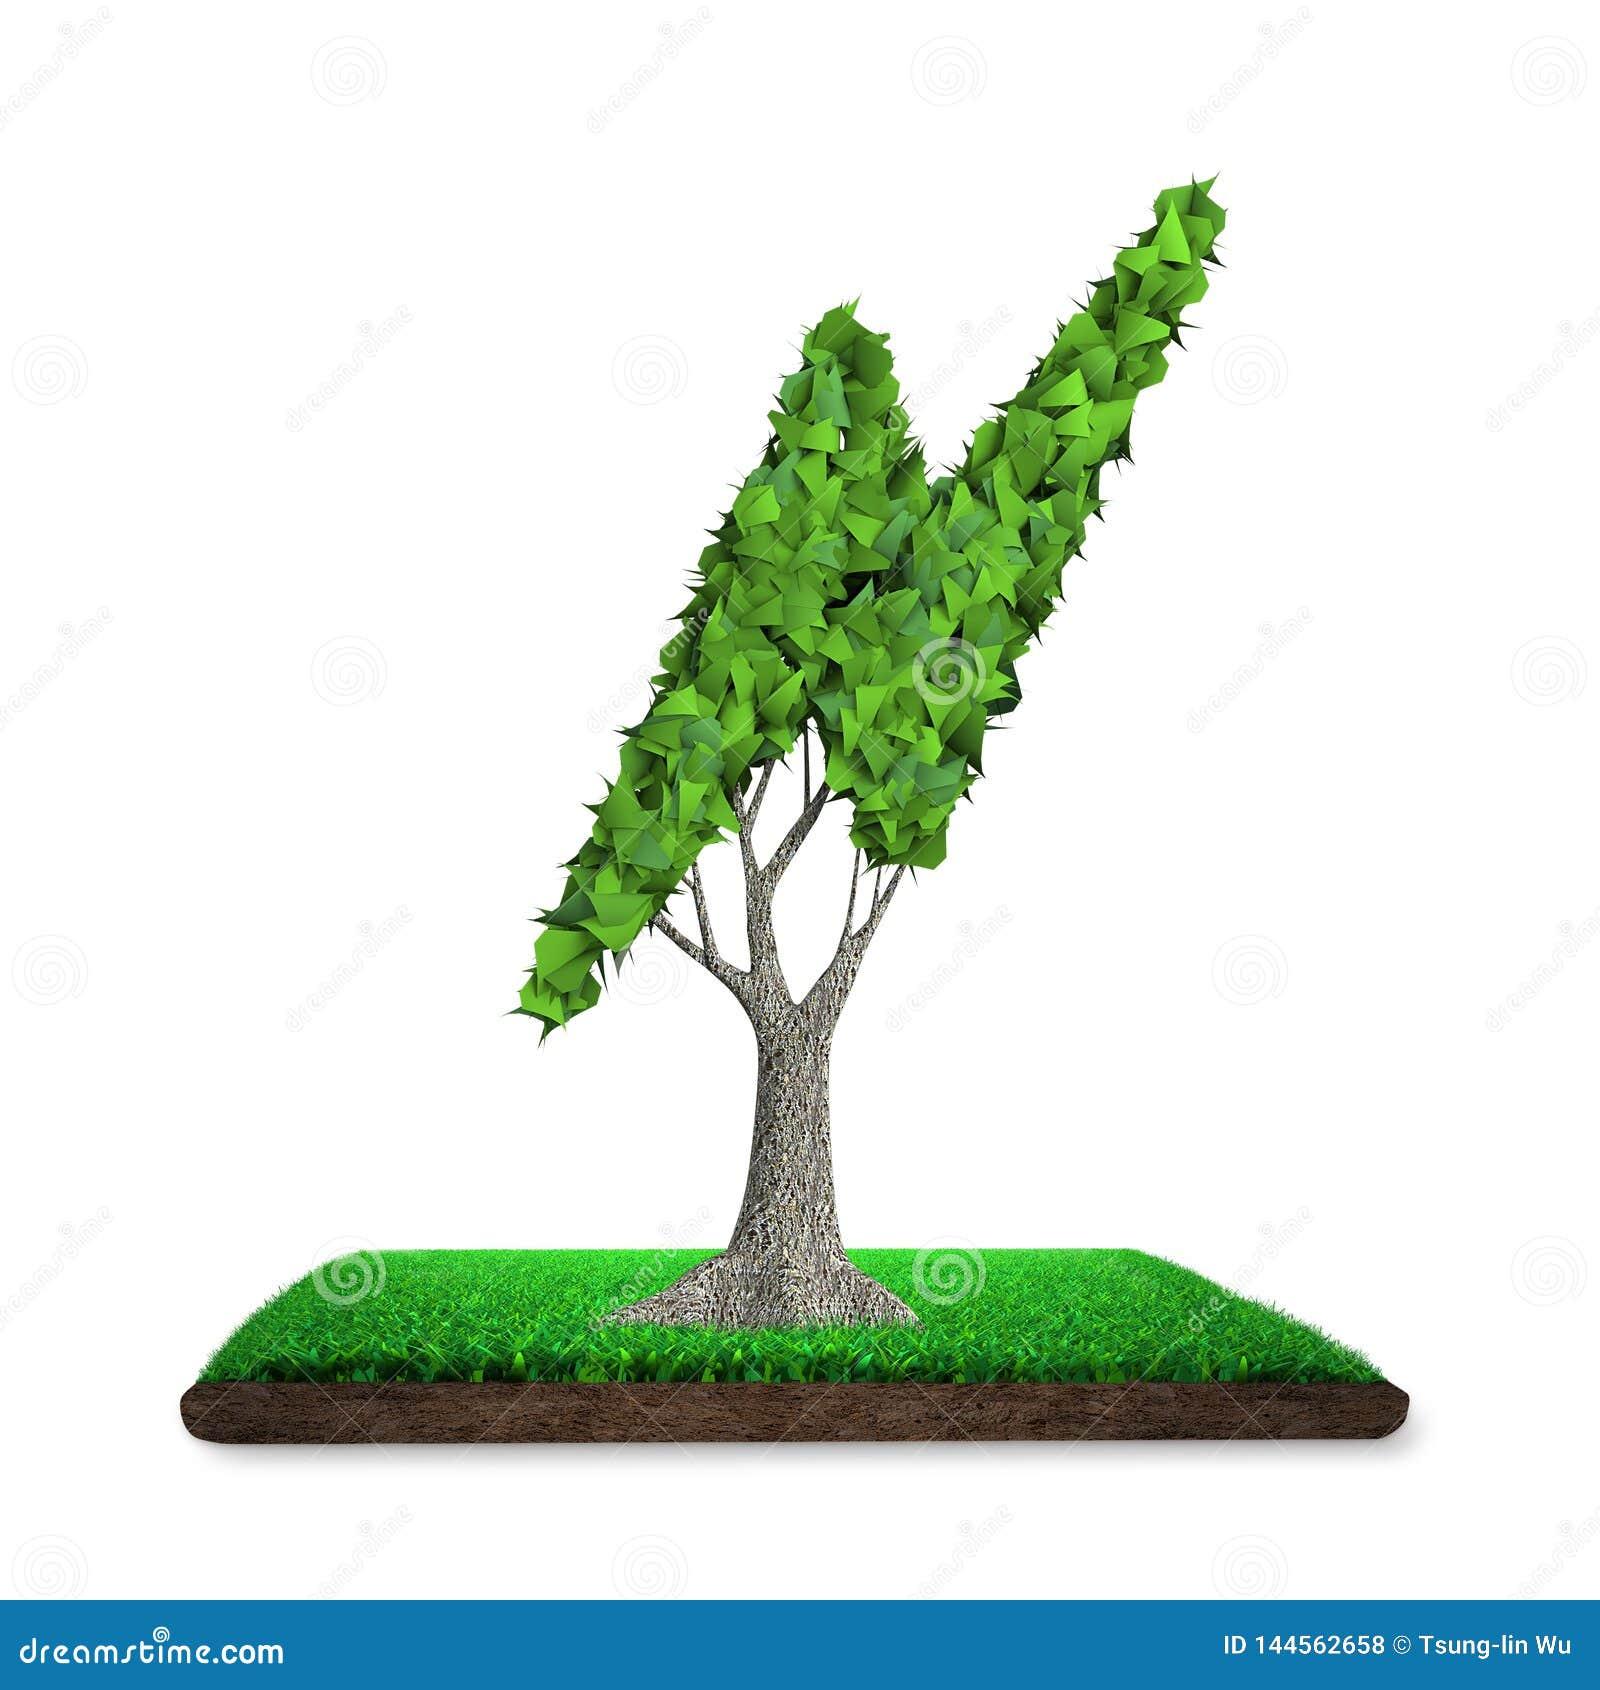 Tree With Lightning Bolt Shape Leaves, Grass Land, 3D